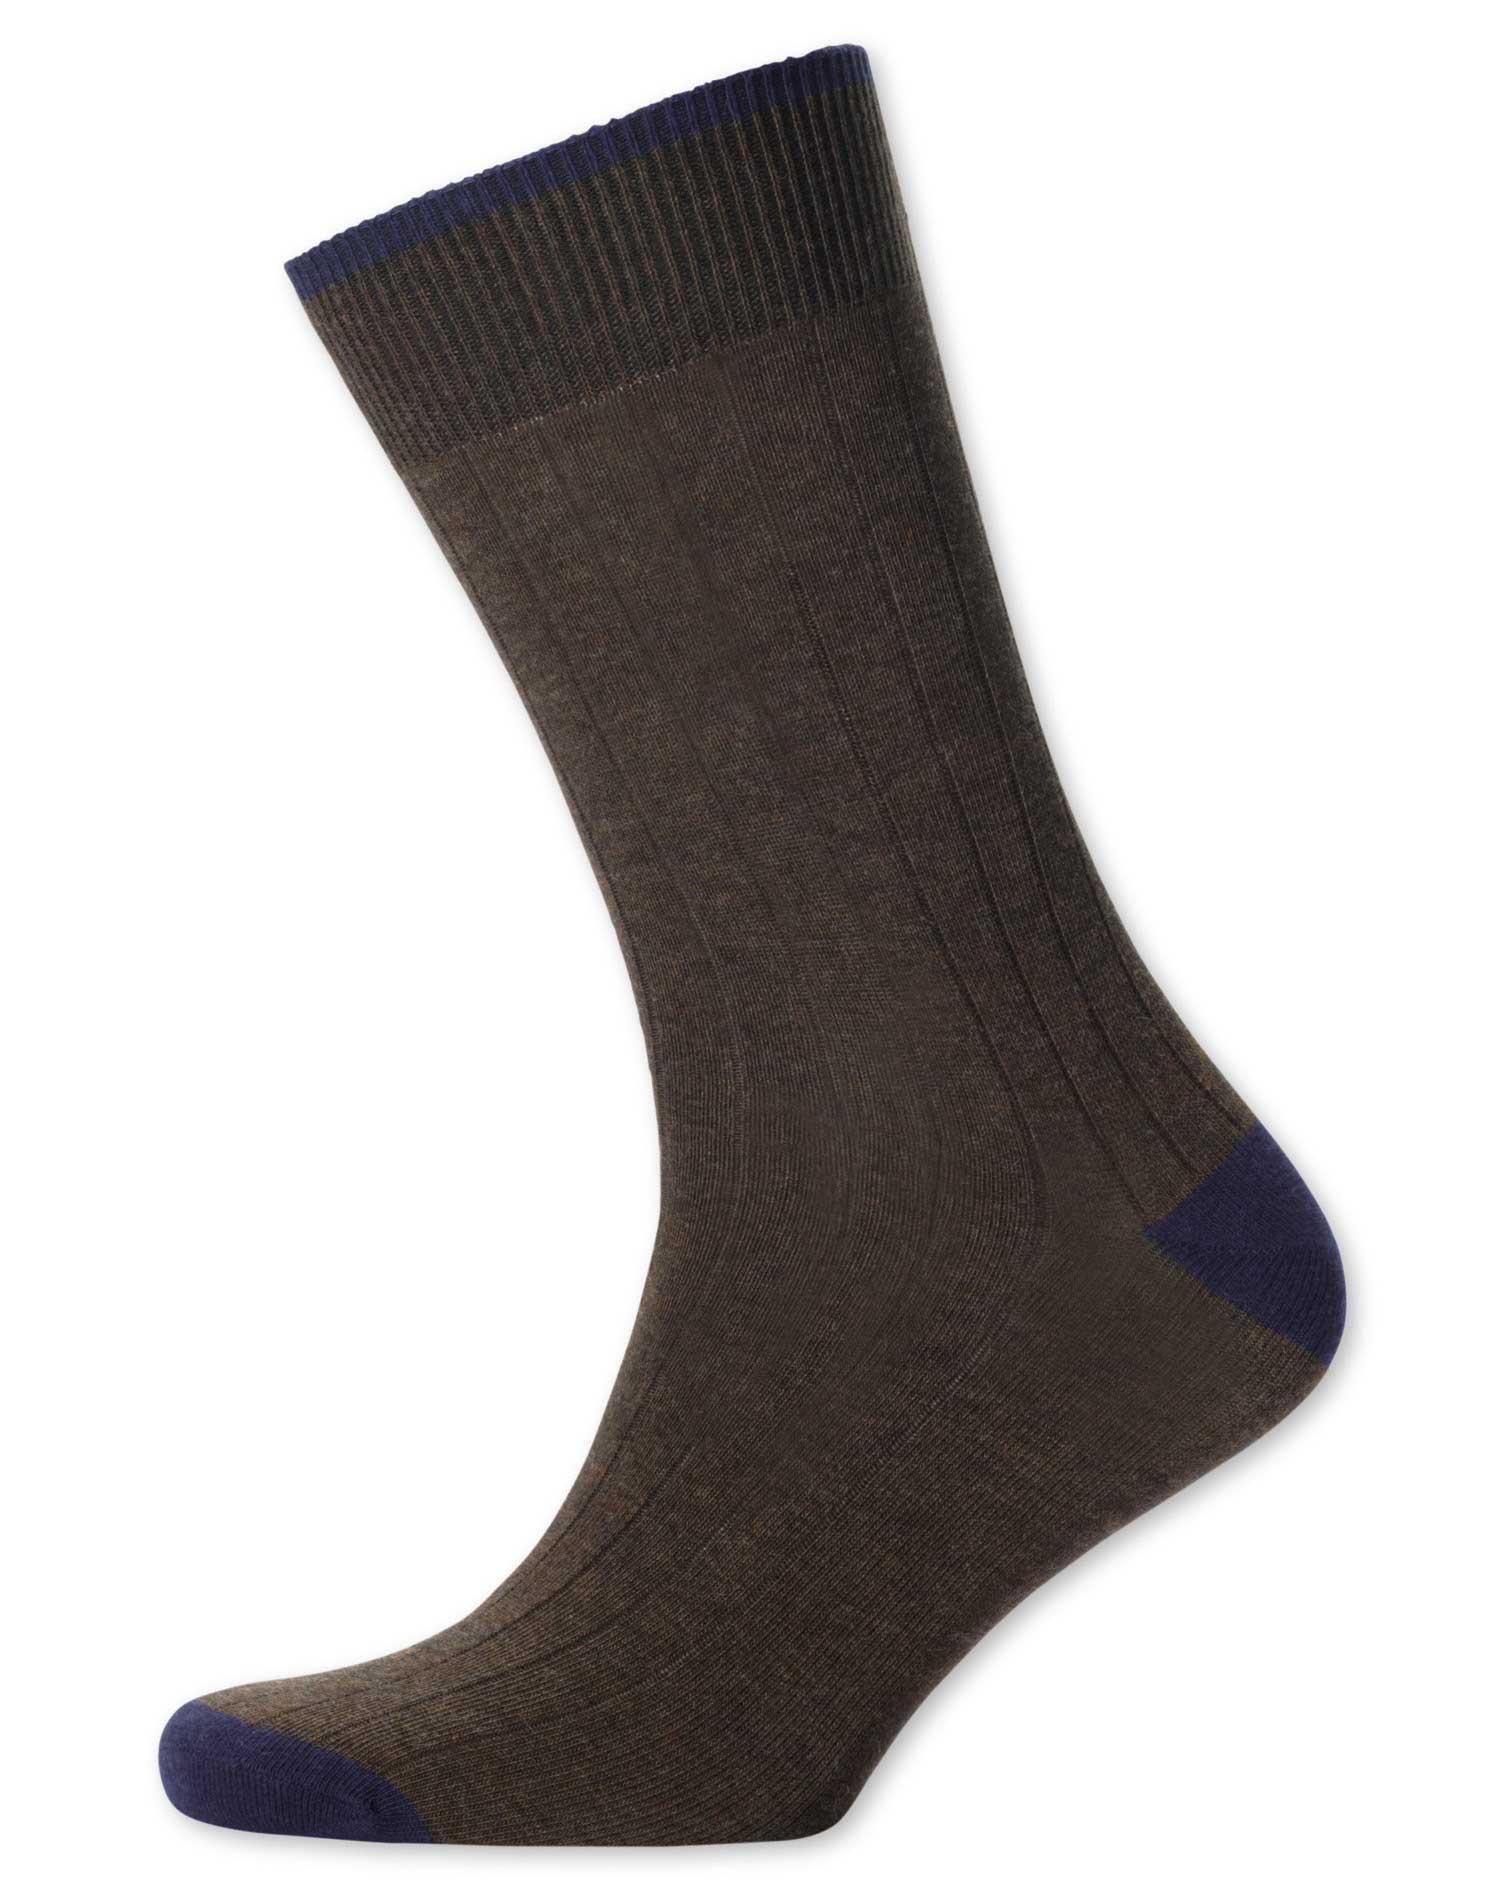 Brown Cotton Rib Socks Size Large by Charles Tyrwhitt